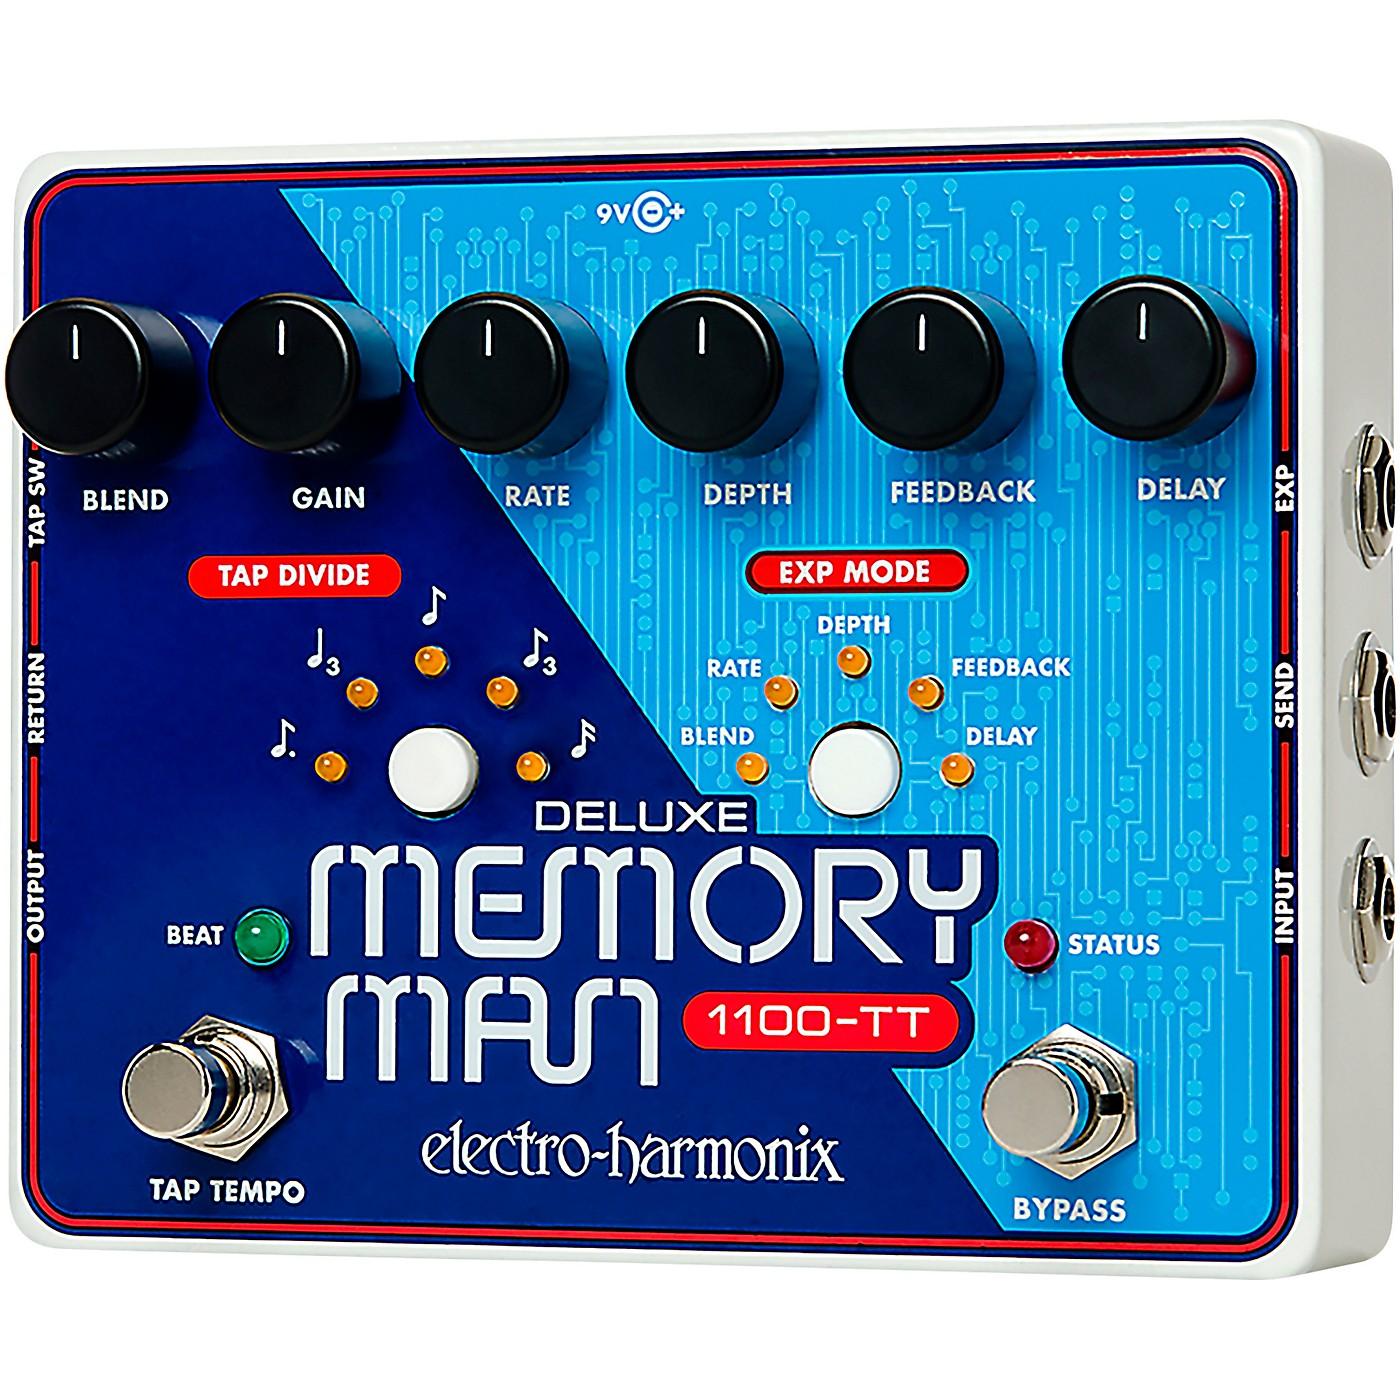 Electro-Harmonix Deluxe Memory Man 1100-TT Guitar Effects Pedal thumbnail